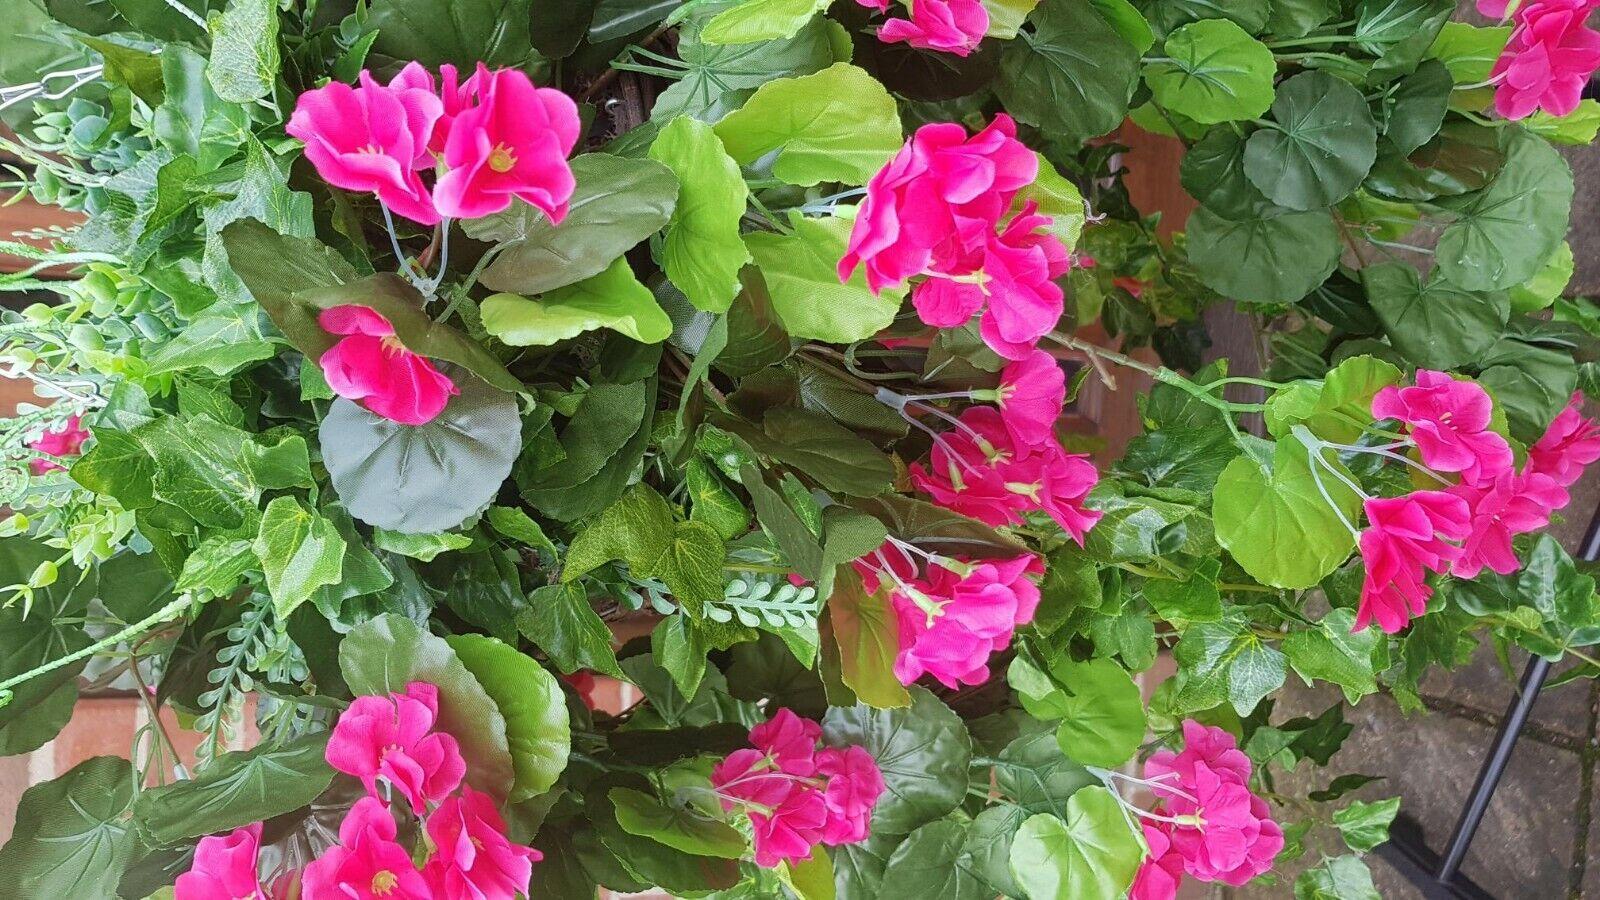 1 Metre Artificial Bespoke Hanging Basket Basket Basket Flowers Ivy Leaf Fern Foliage Plant c4b288